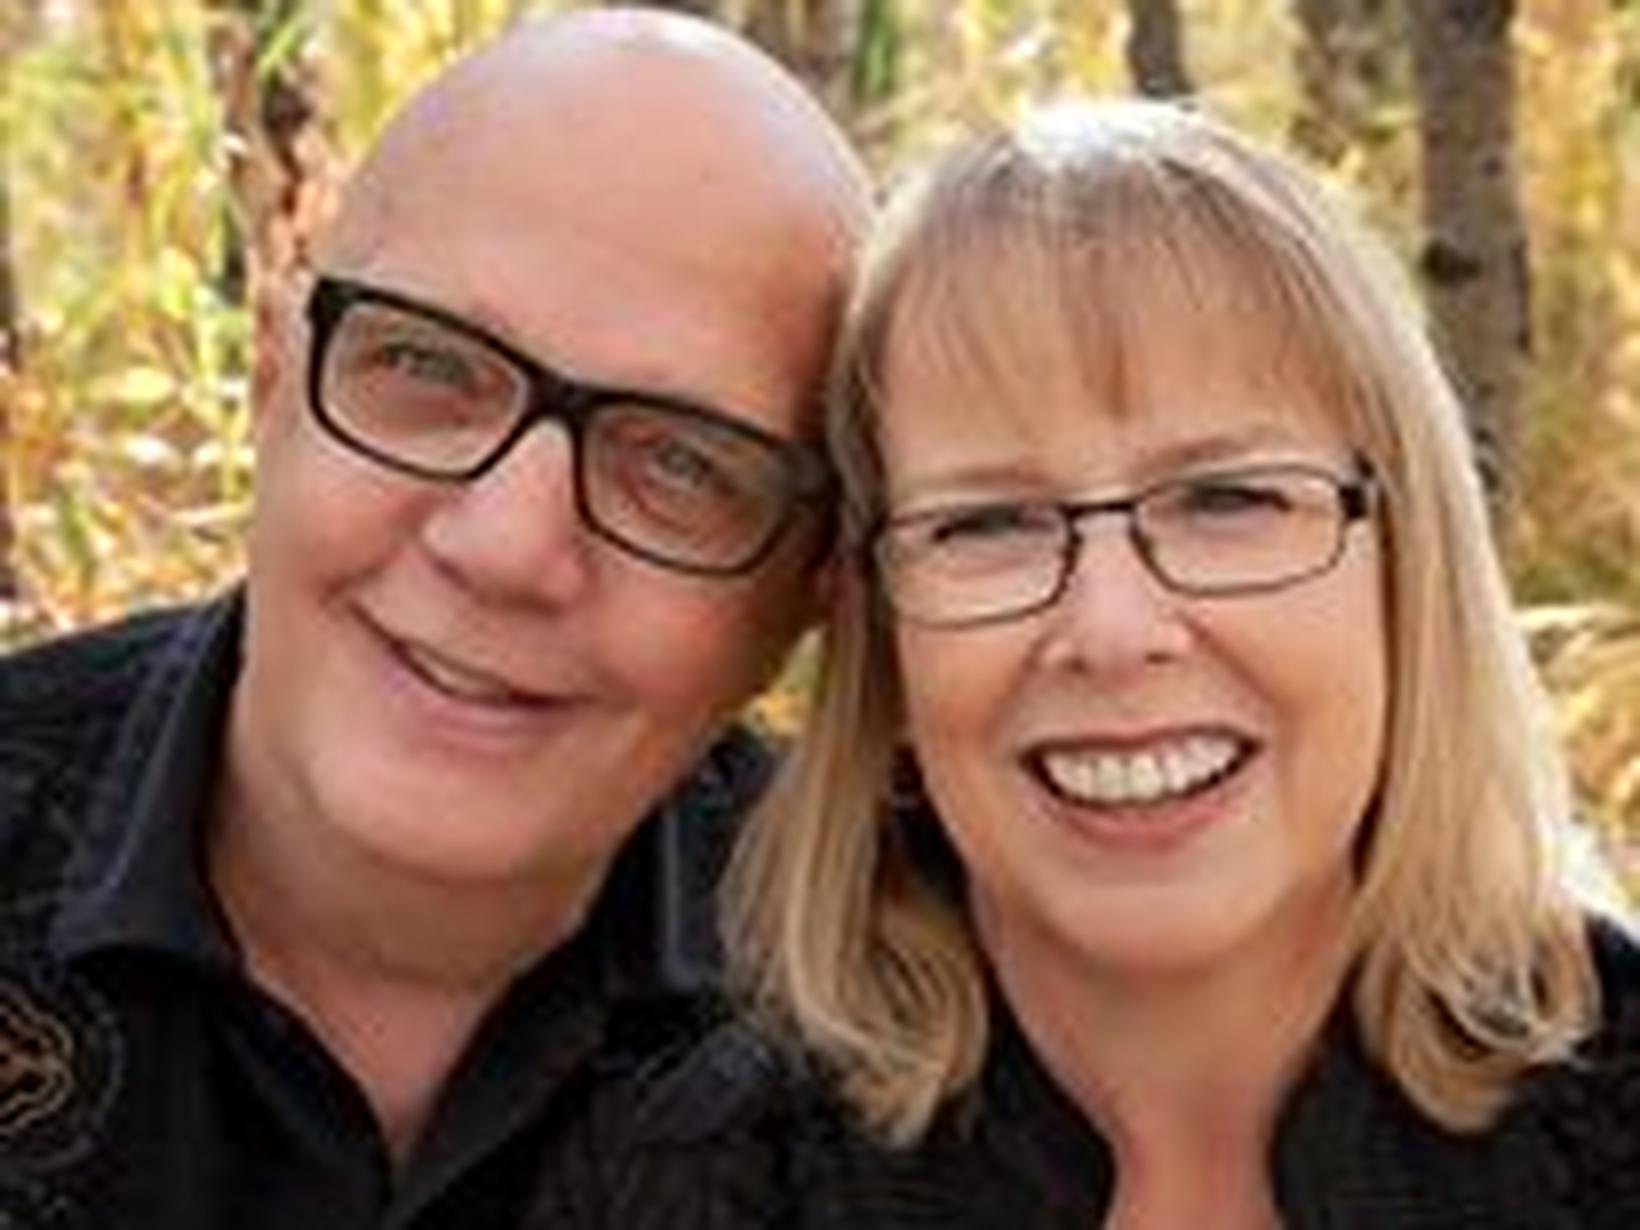 Robert & Janis from Calgary, Alberta, Canada